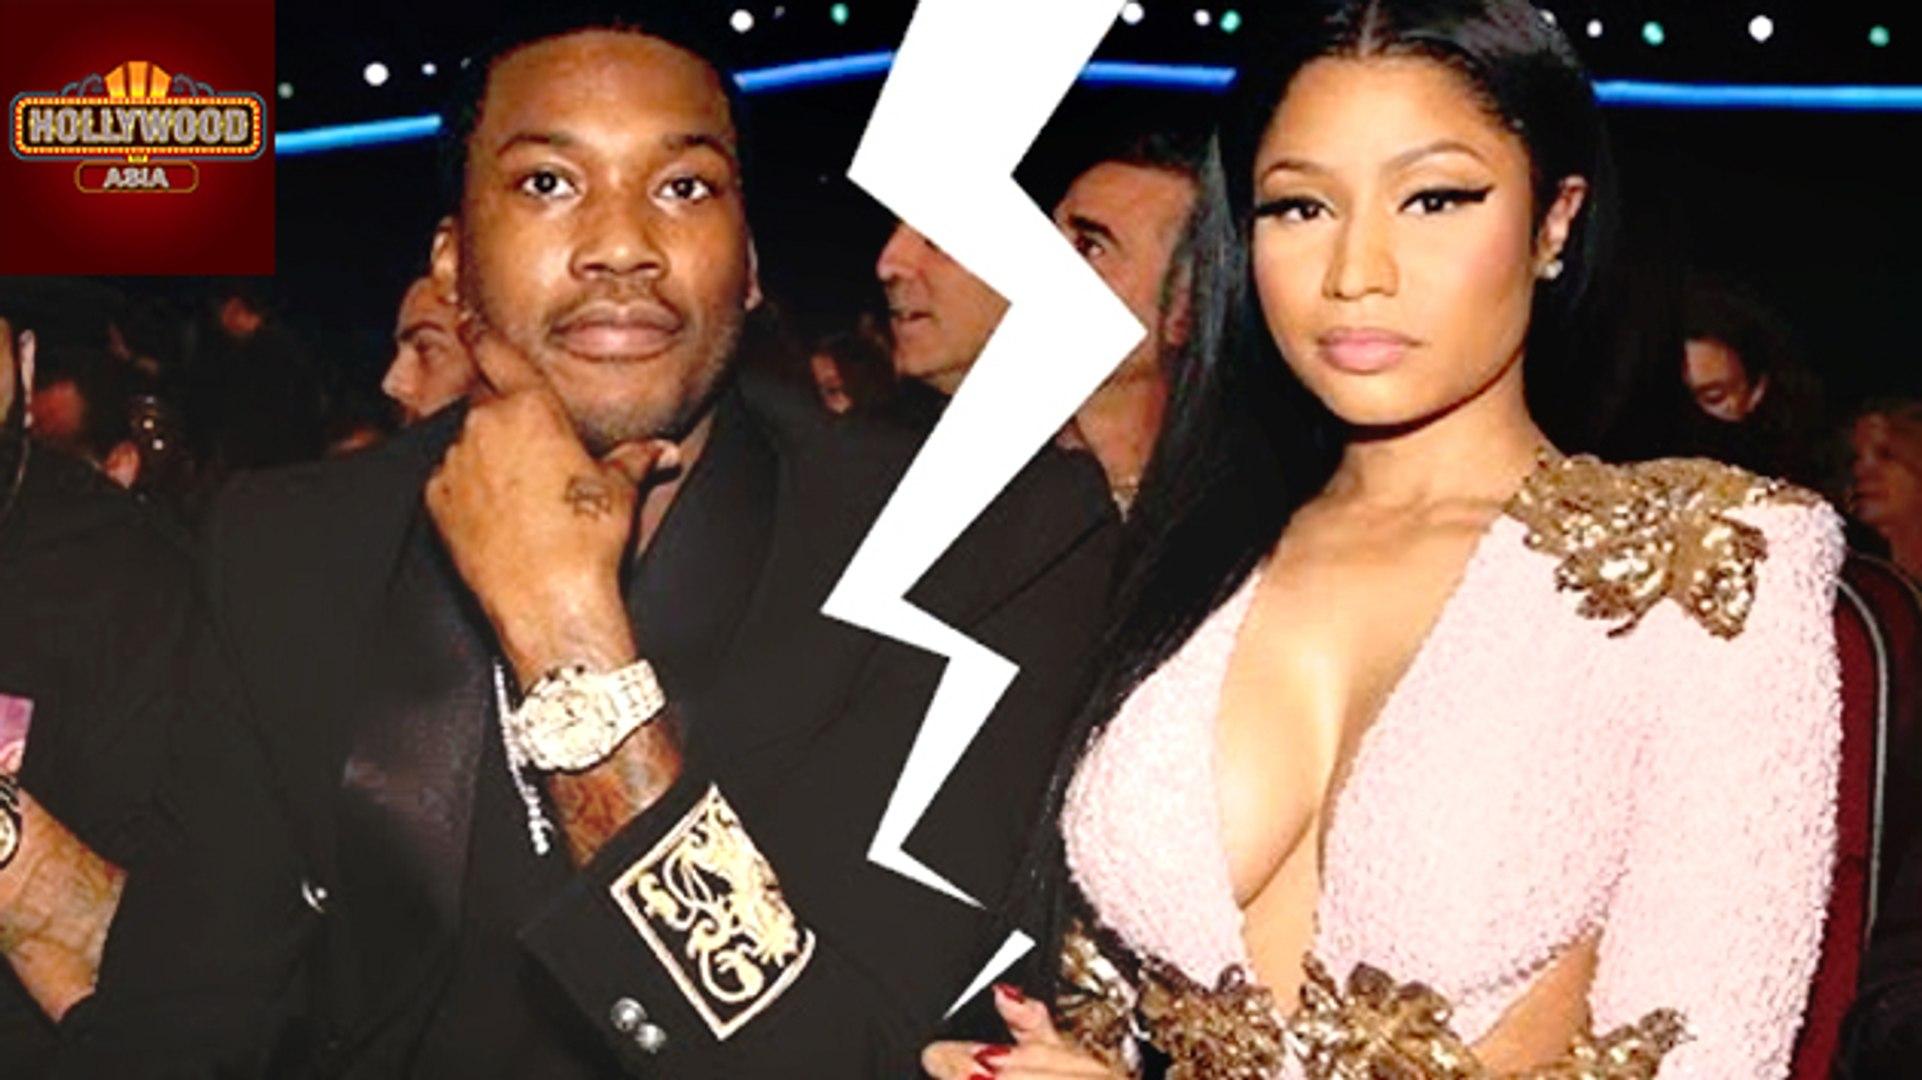 Nicki Minaj Confirms Relationship Status As Single | Hollywood Asia